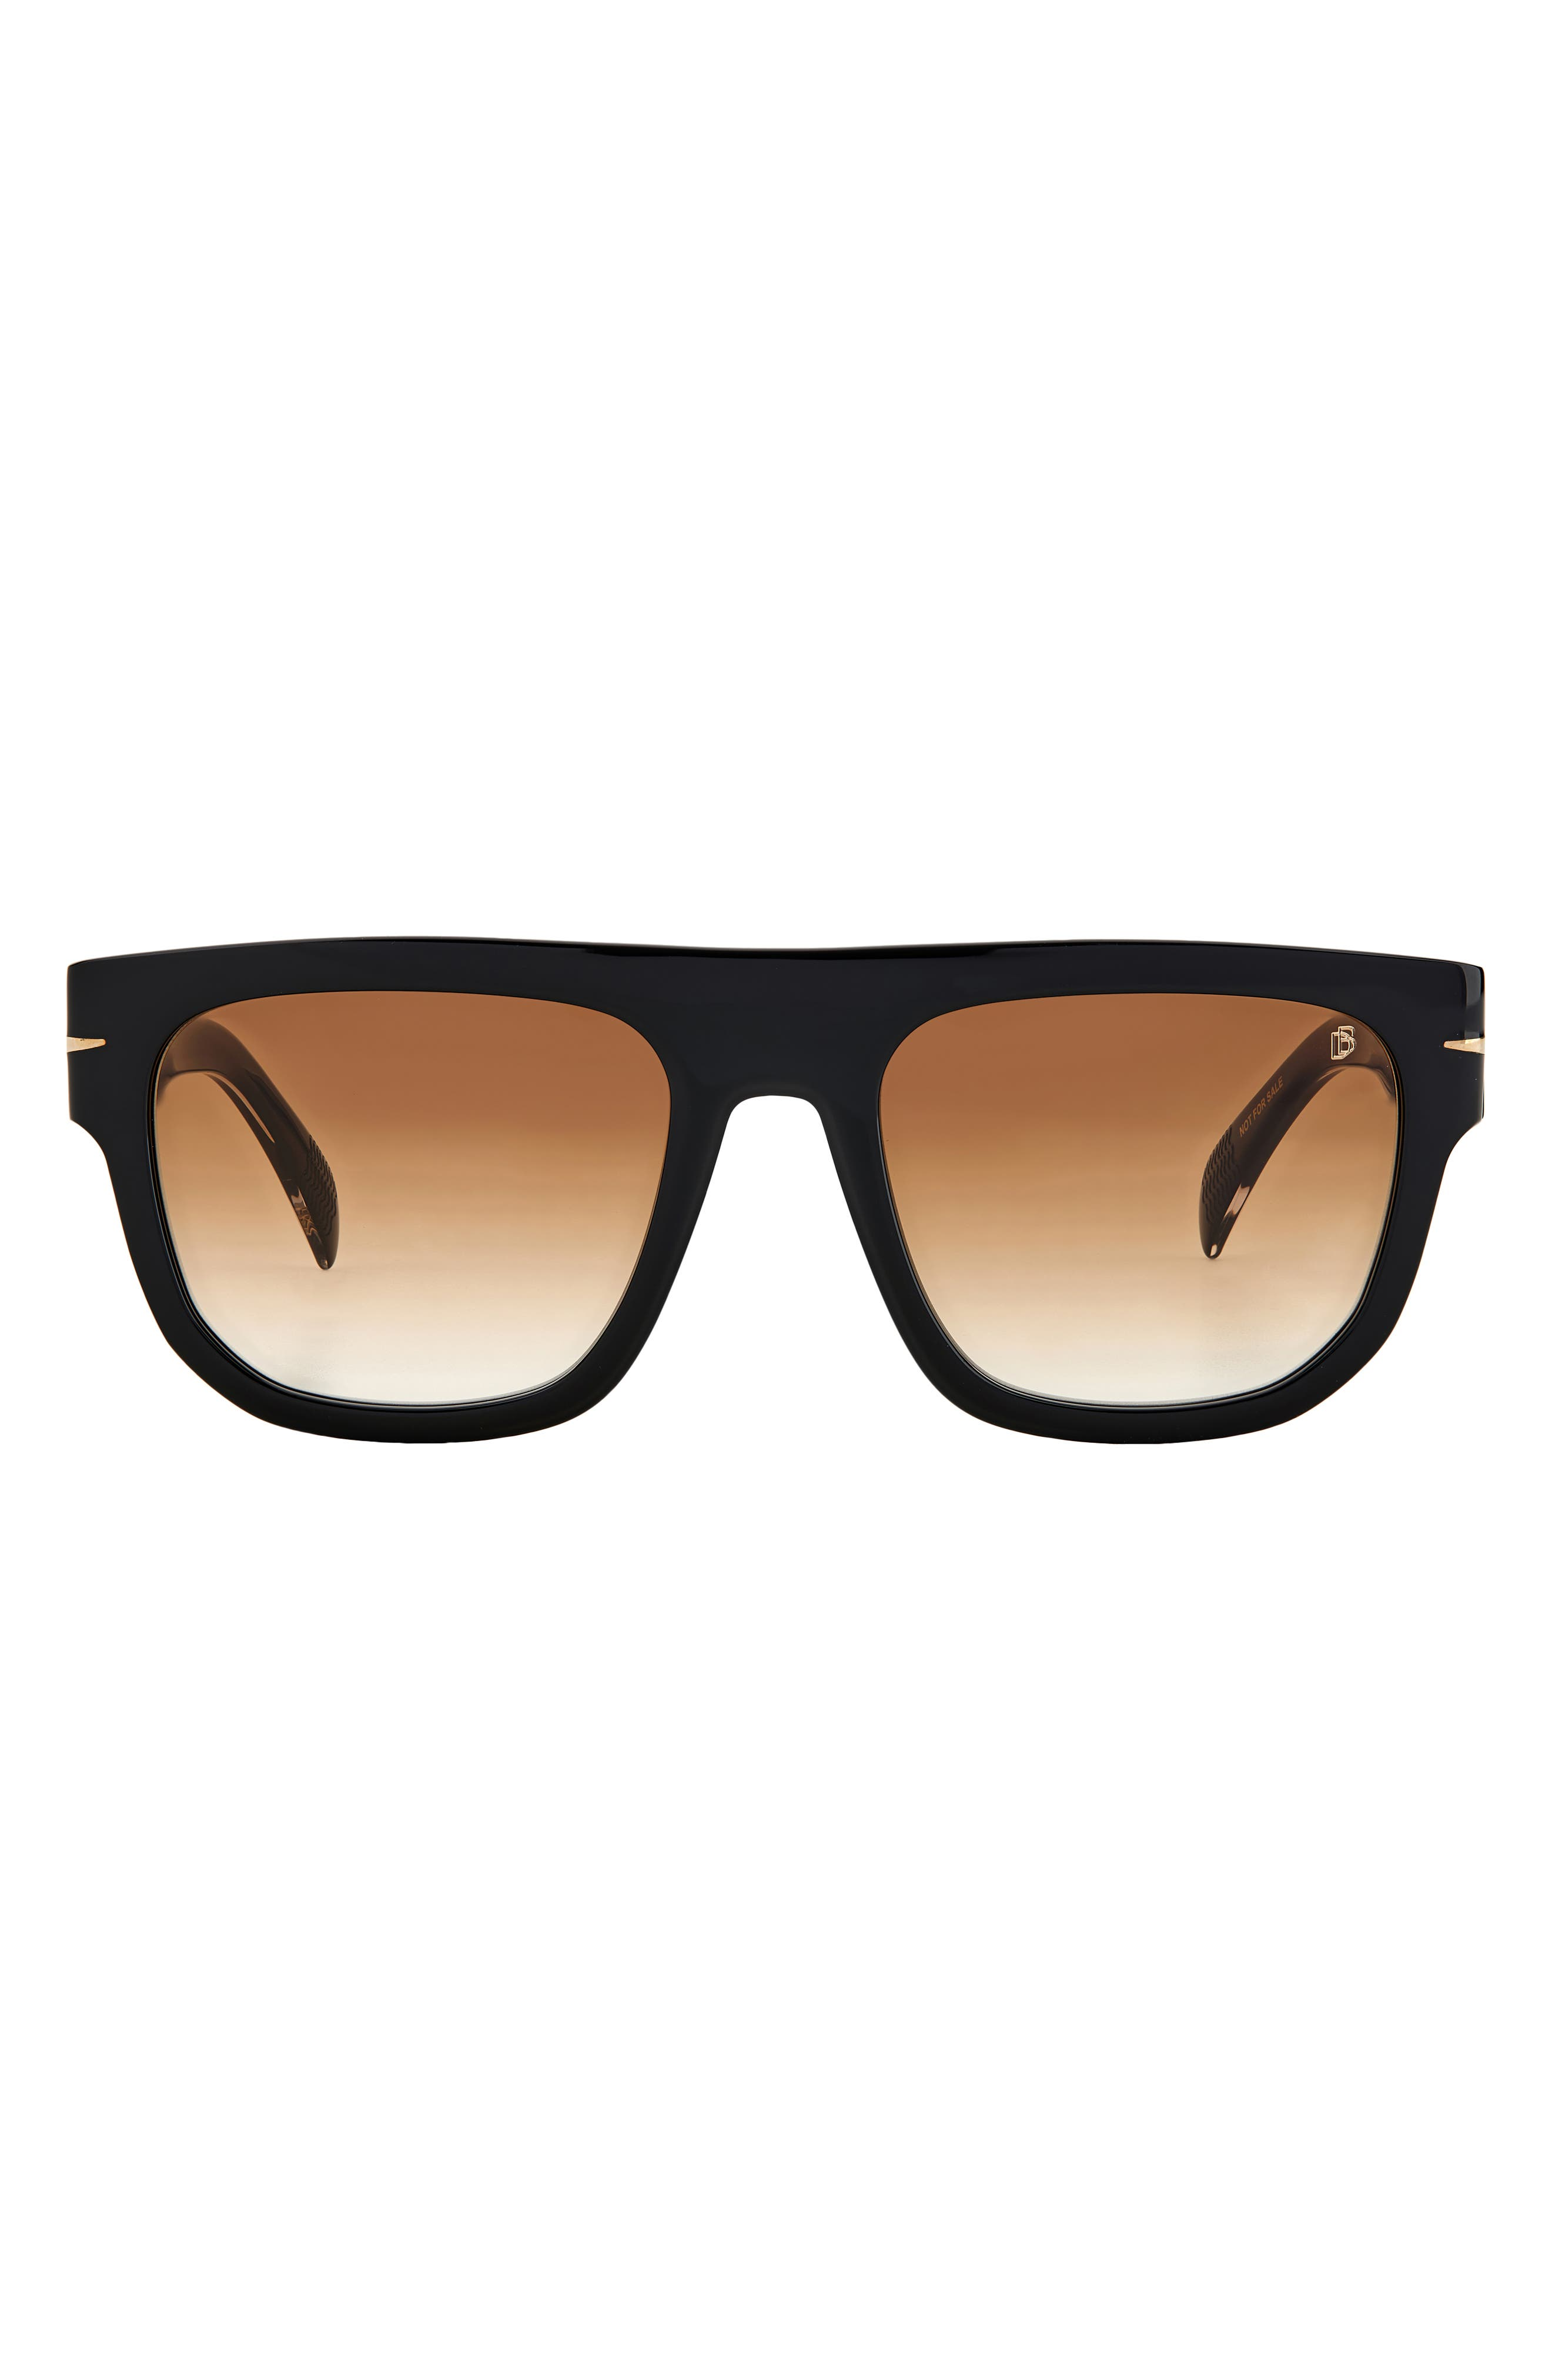 Men's David Beckham 54mm Gradient Flat Top Sunglasses